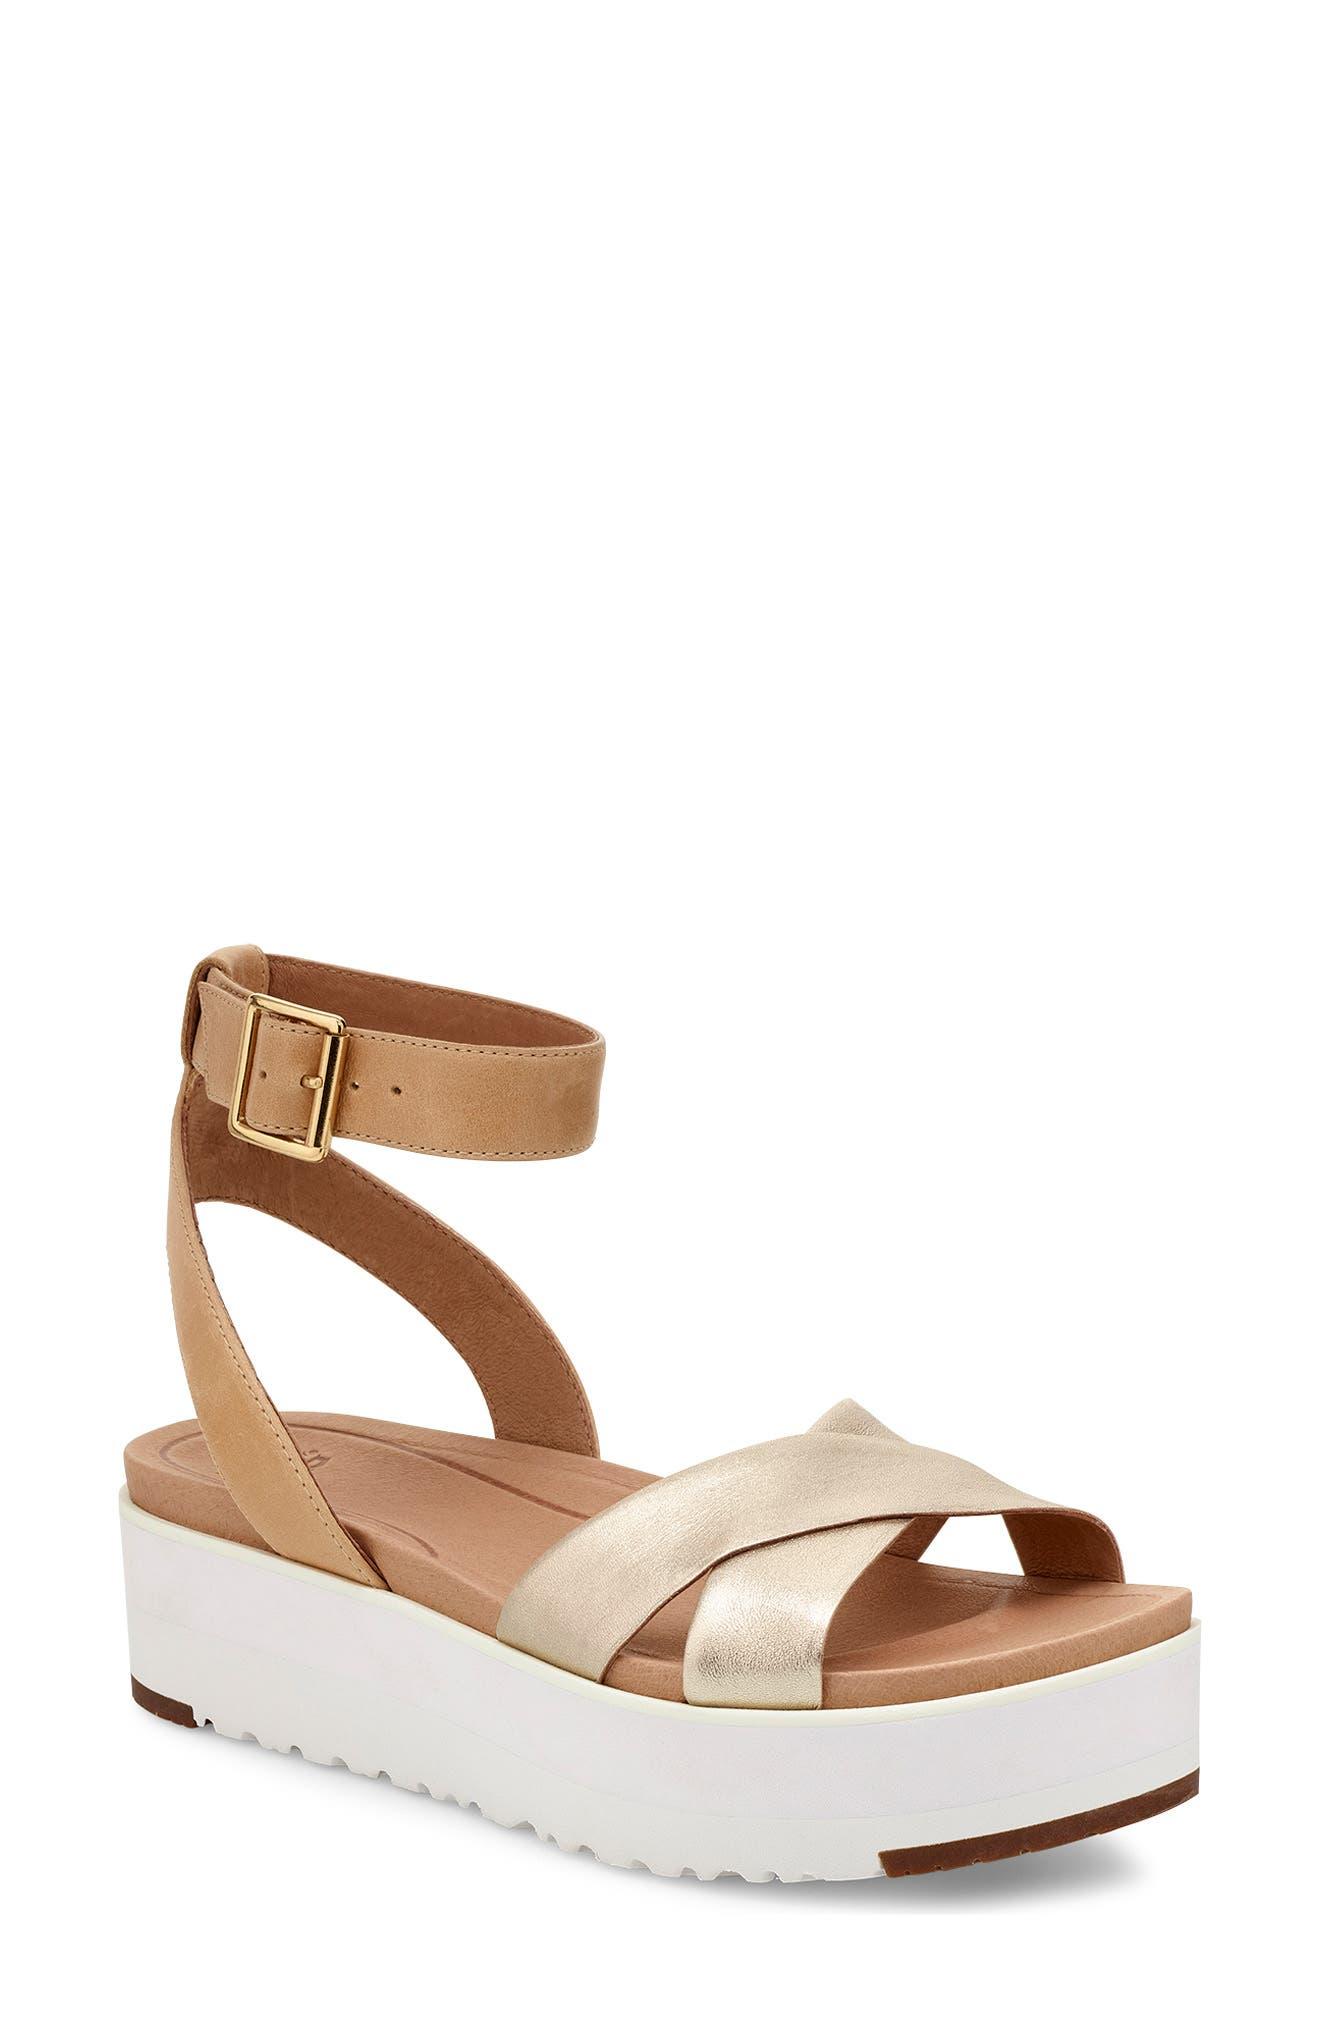 Tipton Metallic Platform Sandal,                             Main thumbnail 1, color,                             GOLD